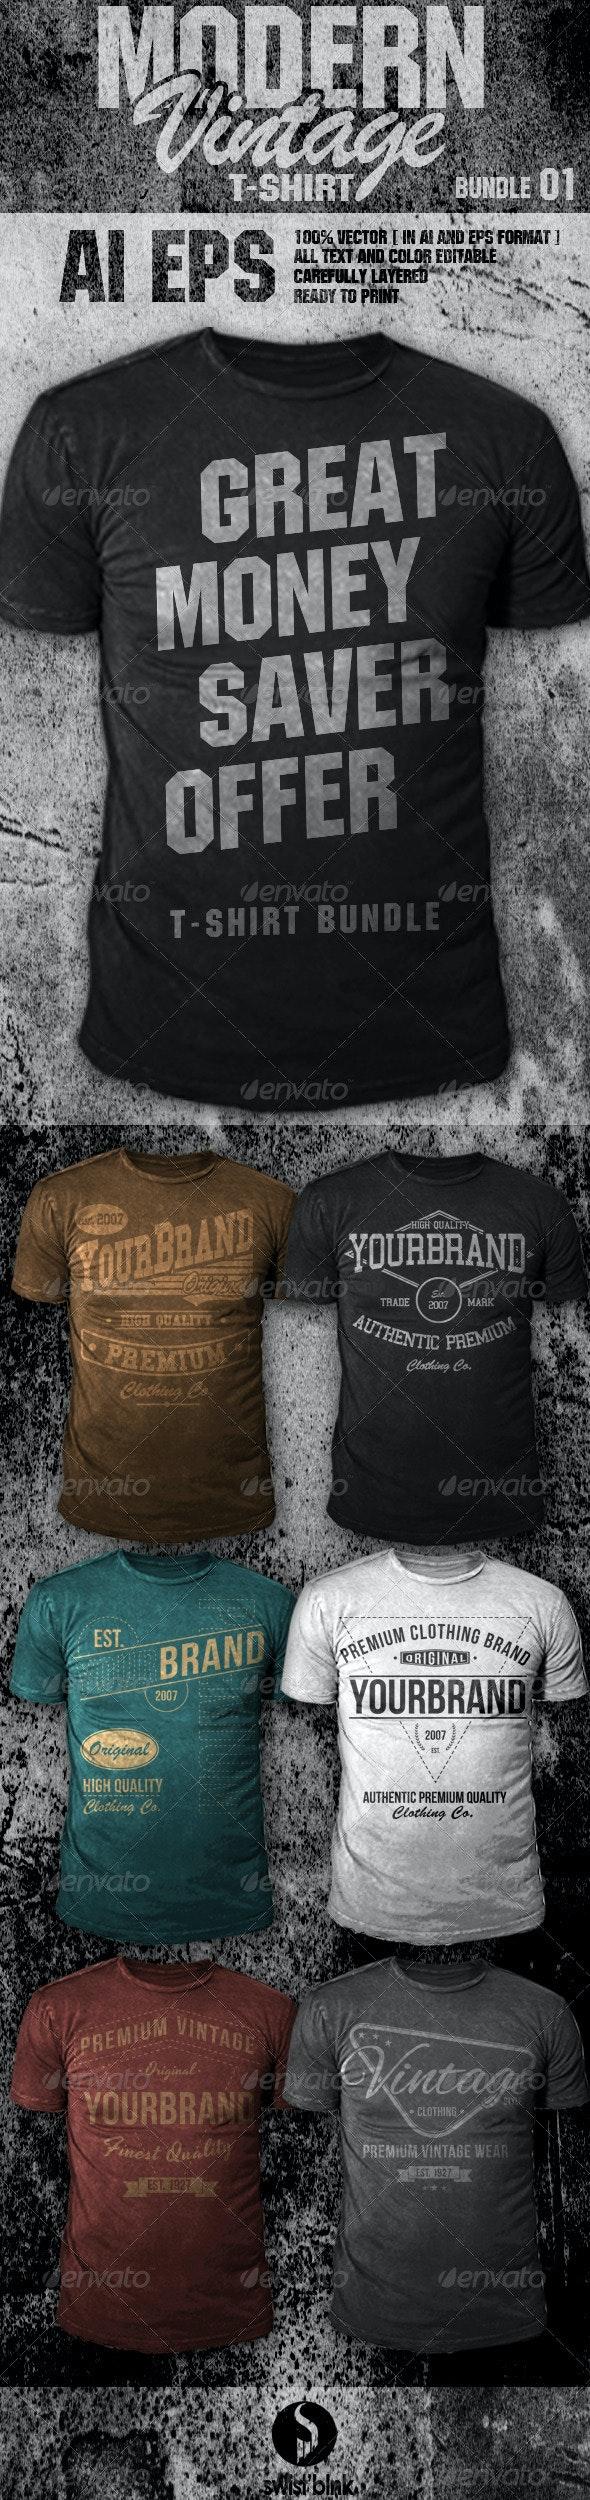 Modern Vintage T-Shirt Bundle 01 - Designs T-Shirts